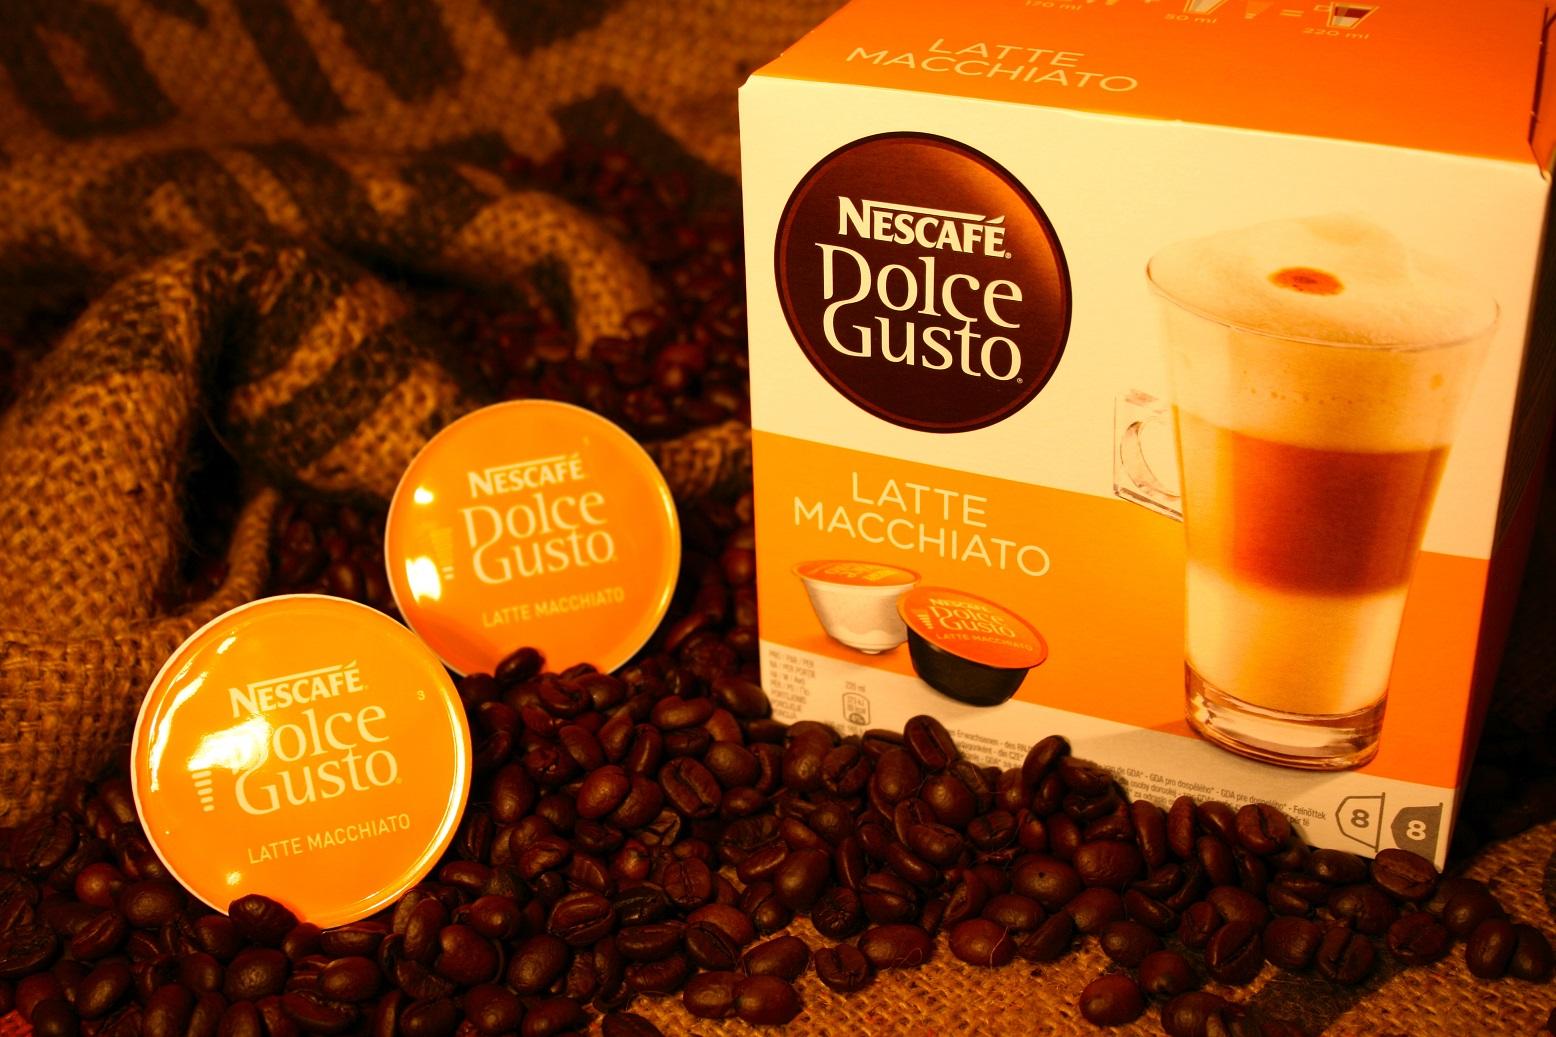 32 latte macchiato nescaf dolce gusto kapseln ebay. Black Bedroom Furniture Sets. Home Design Ideas